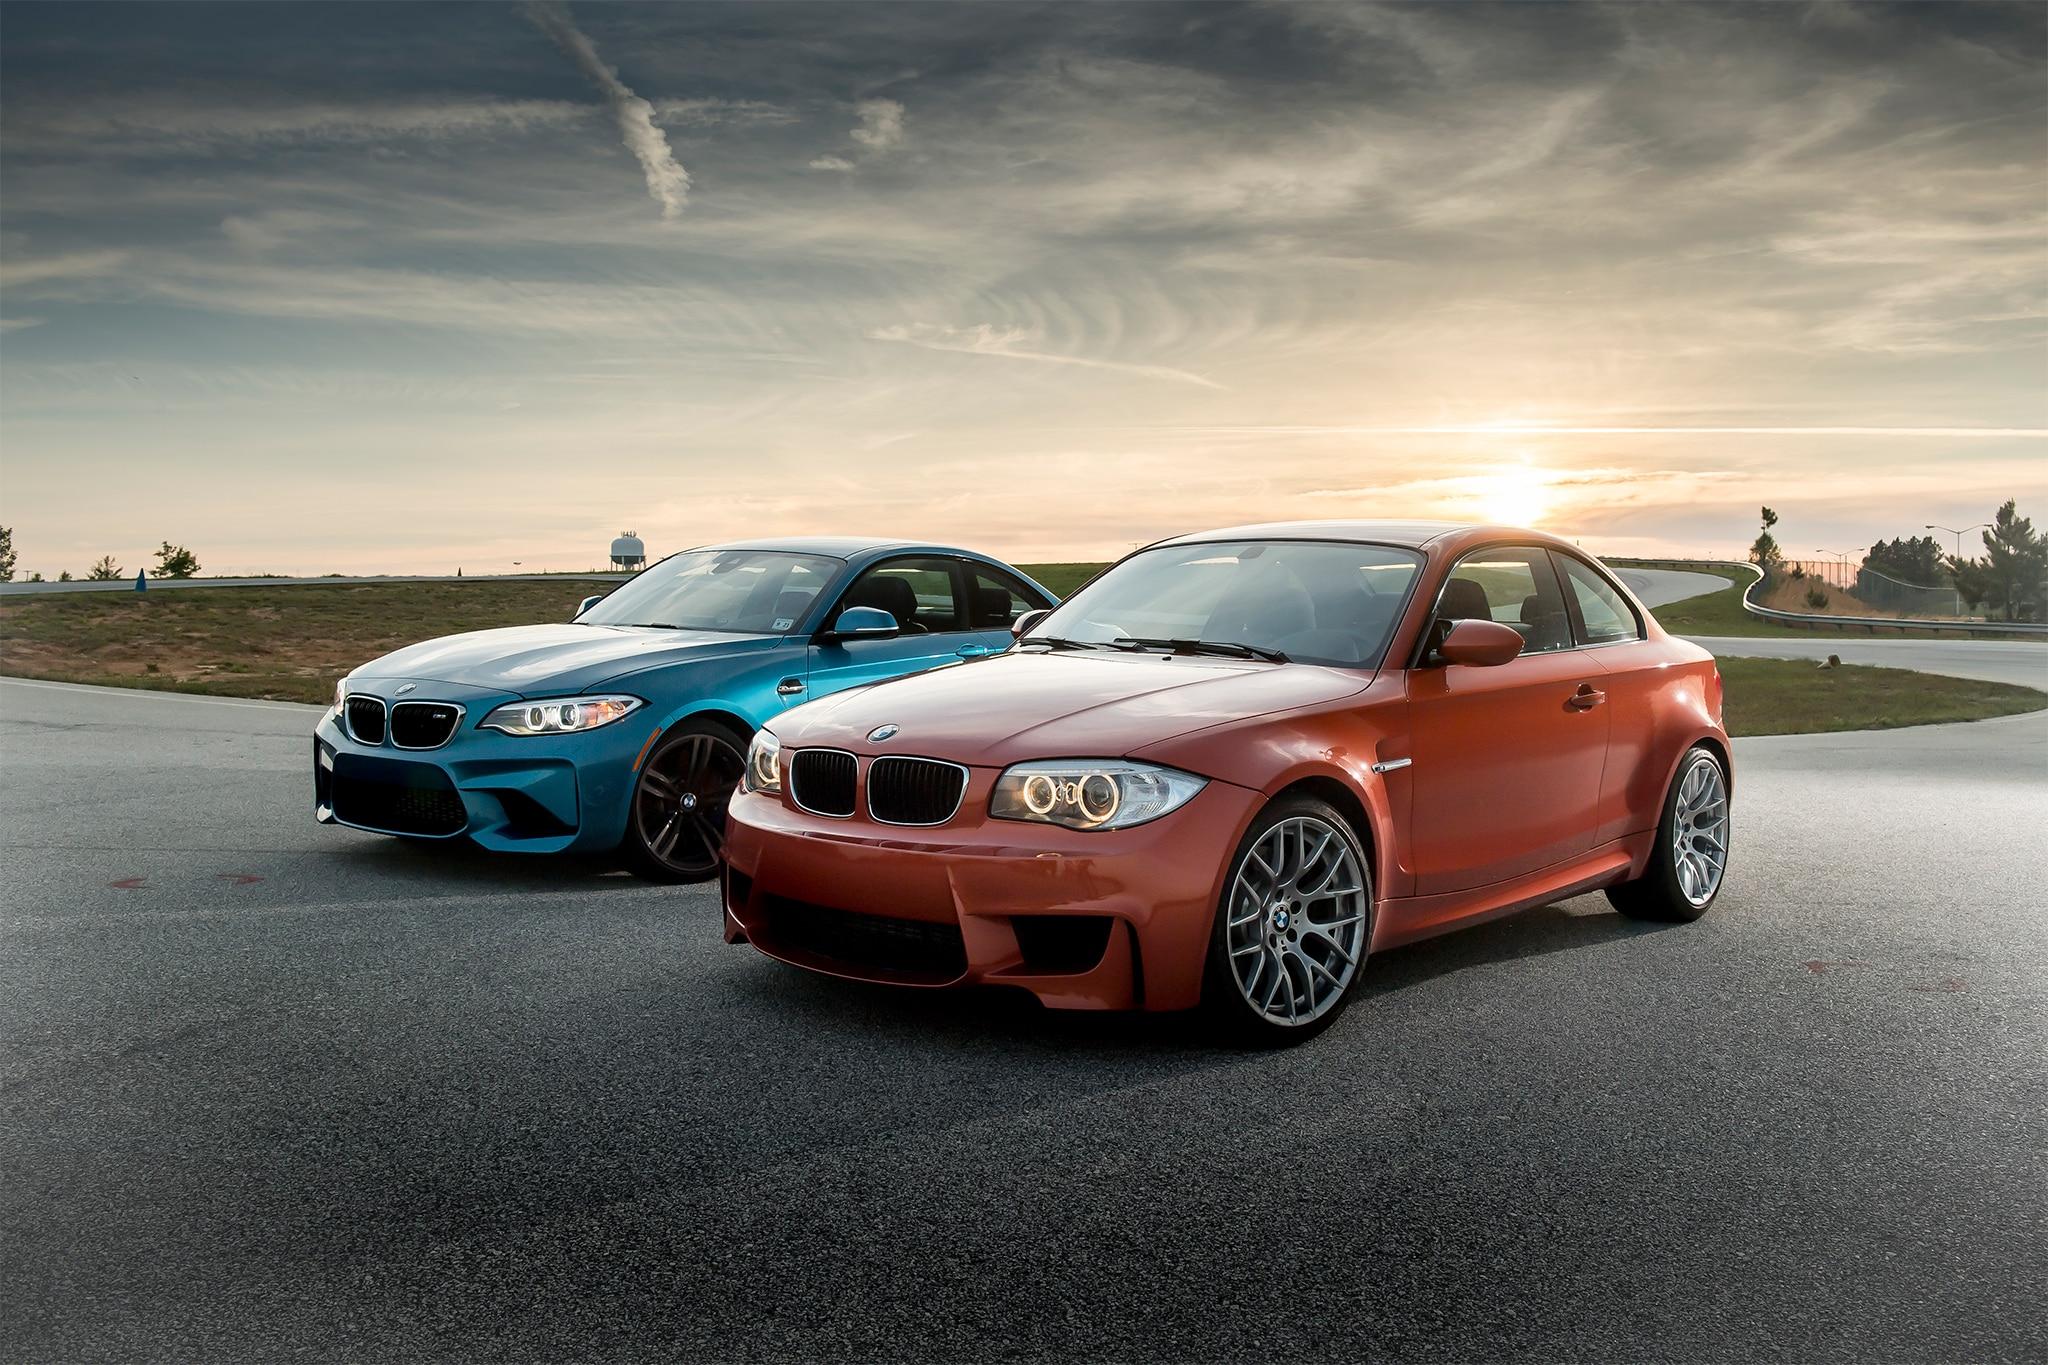 Bmw M2 Series >> 2 vs 1: Our Four Seasons BMW M2 Travels to the Carolinas to Meet its Predecessor   Automobile ...